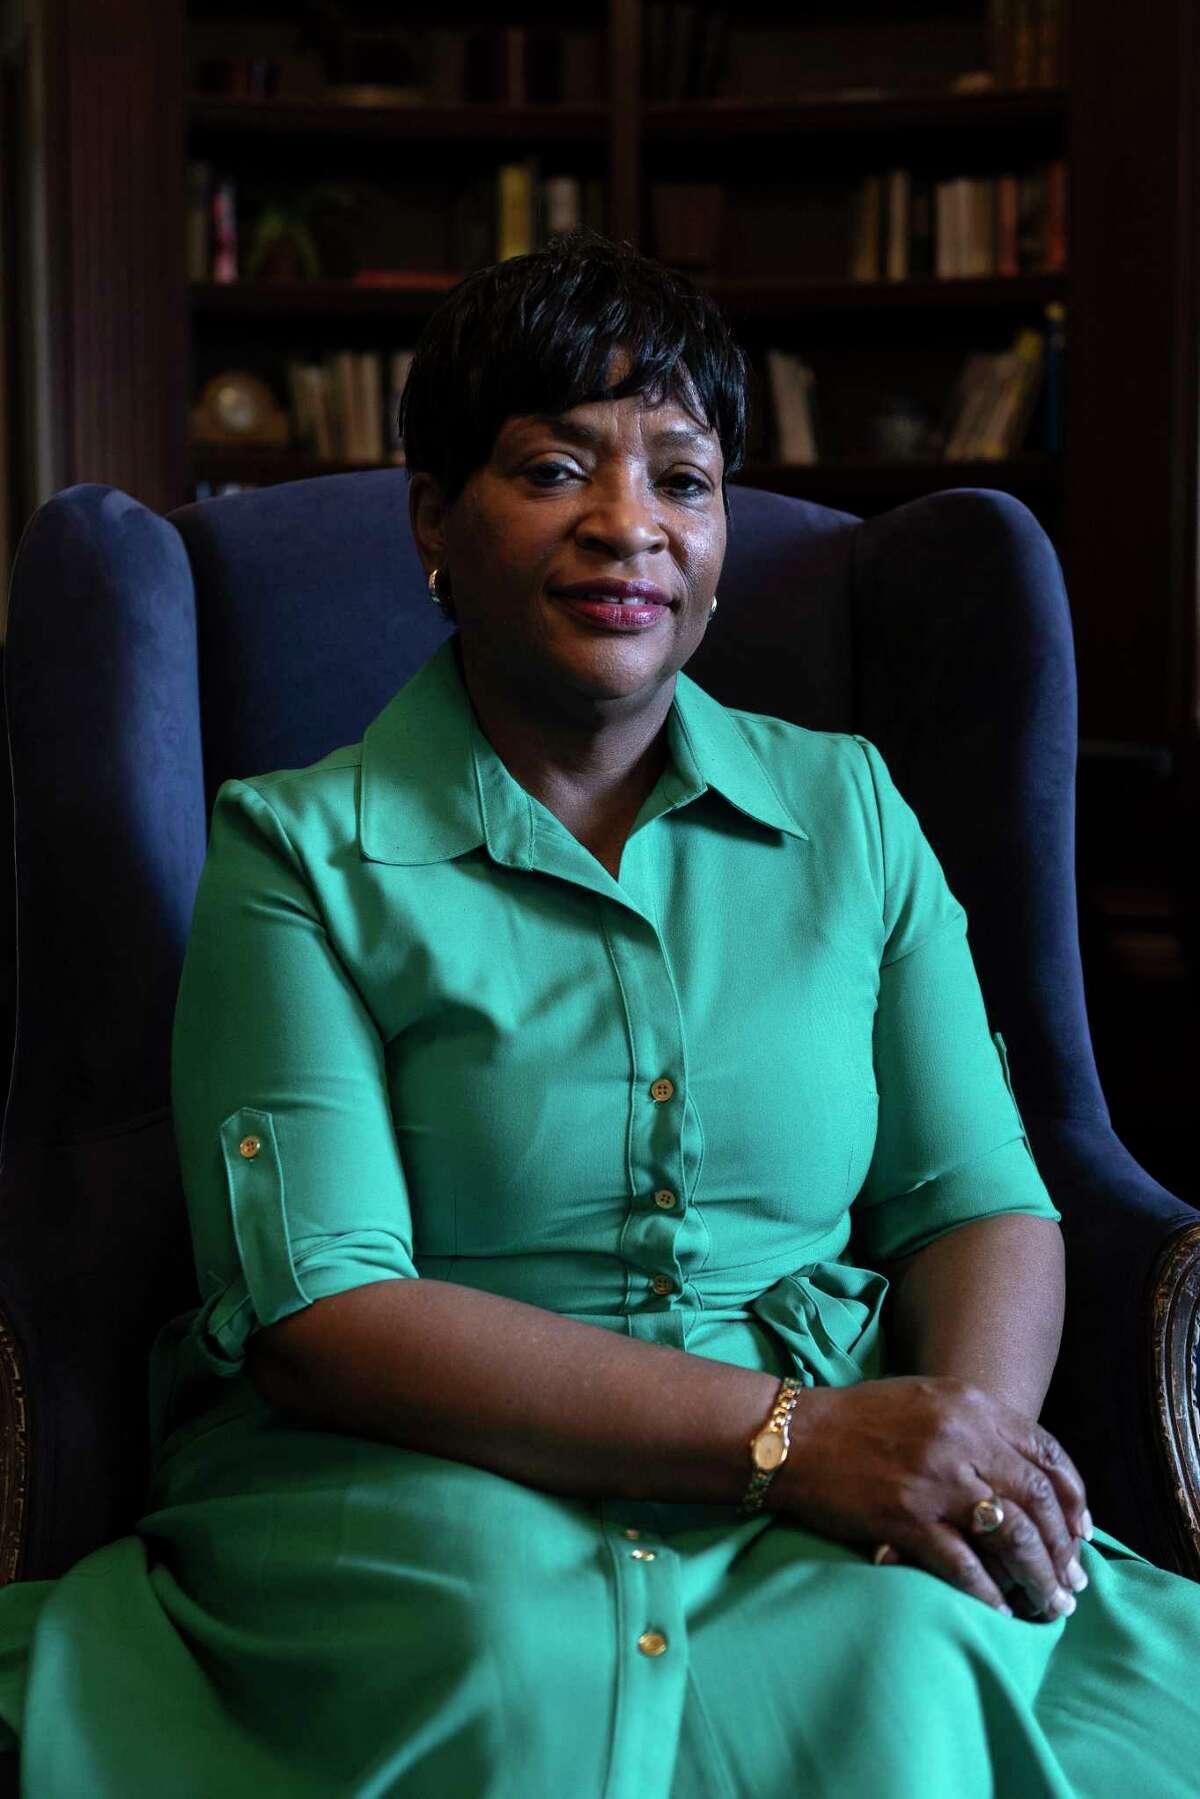 Maryland House speaker to unveil 'Black agenda'